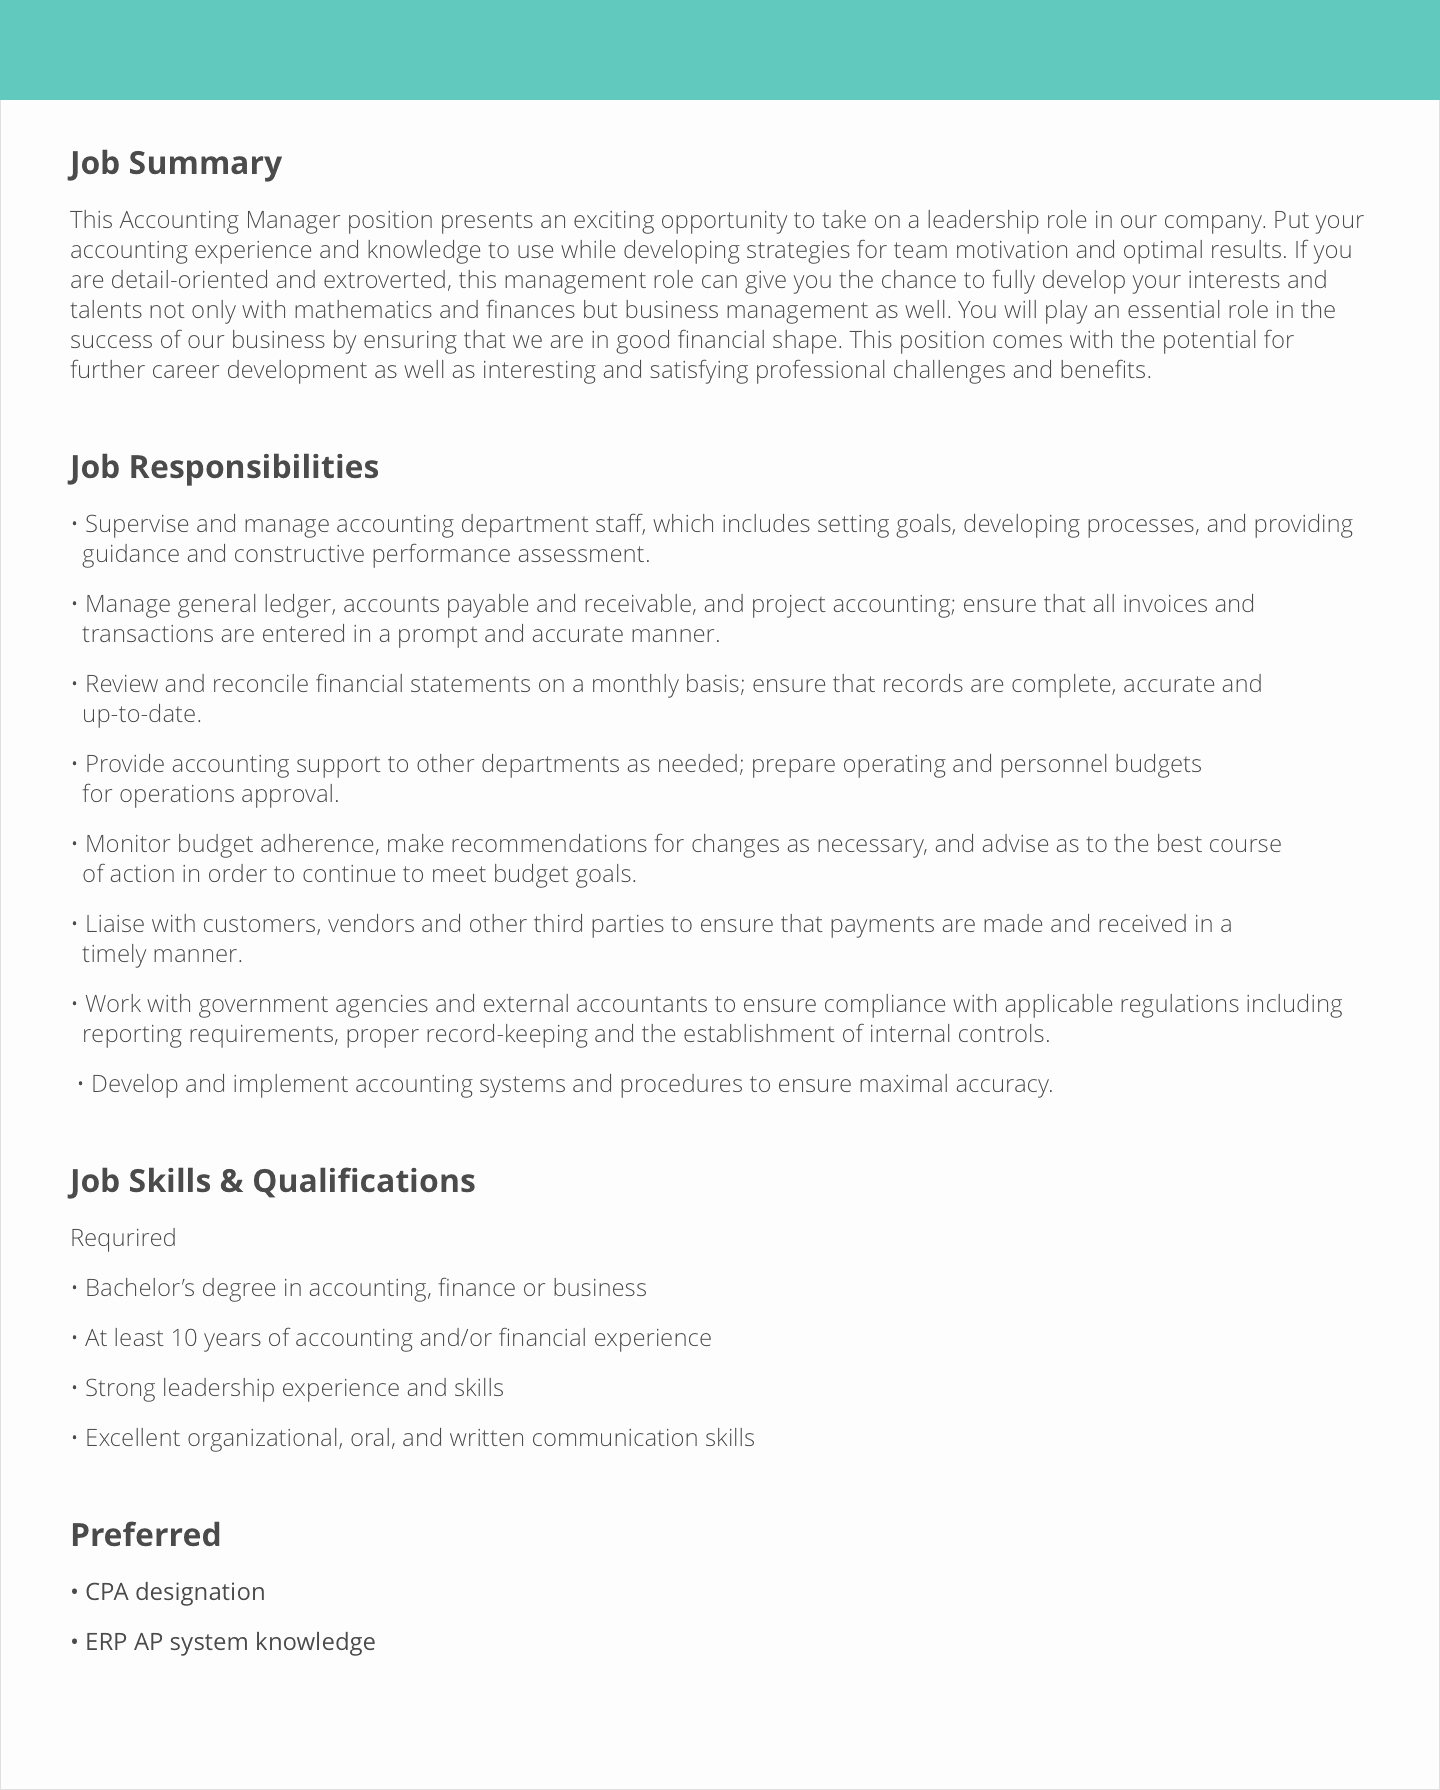 Sales and Marketing Job Description Awesome Job Description Samples & Examples